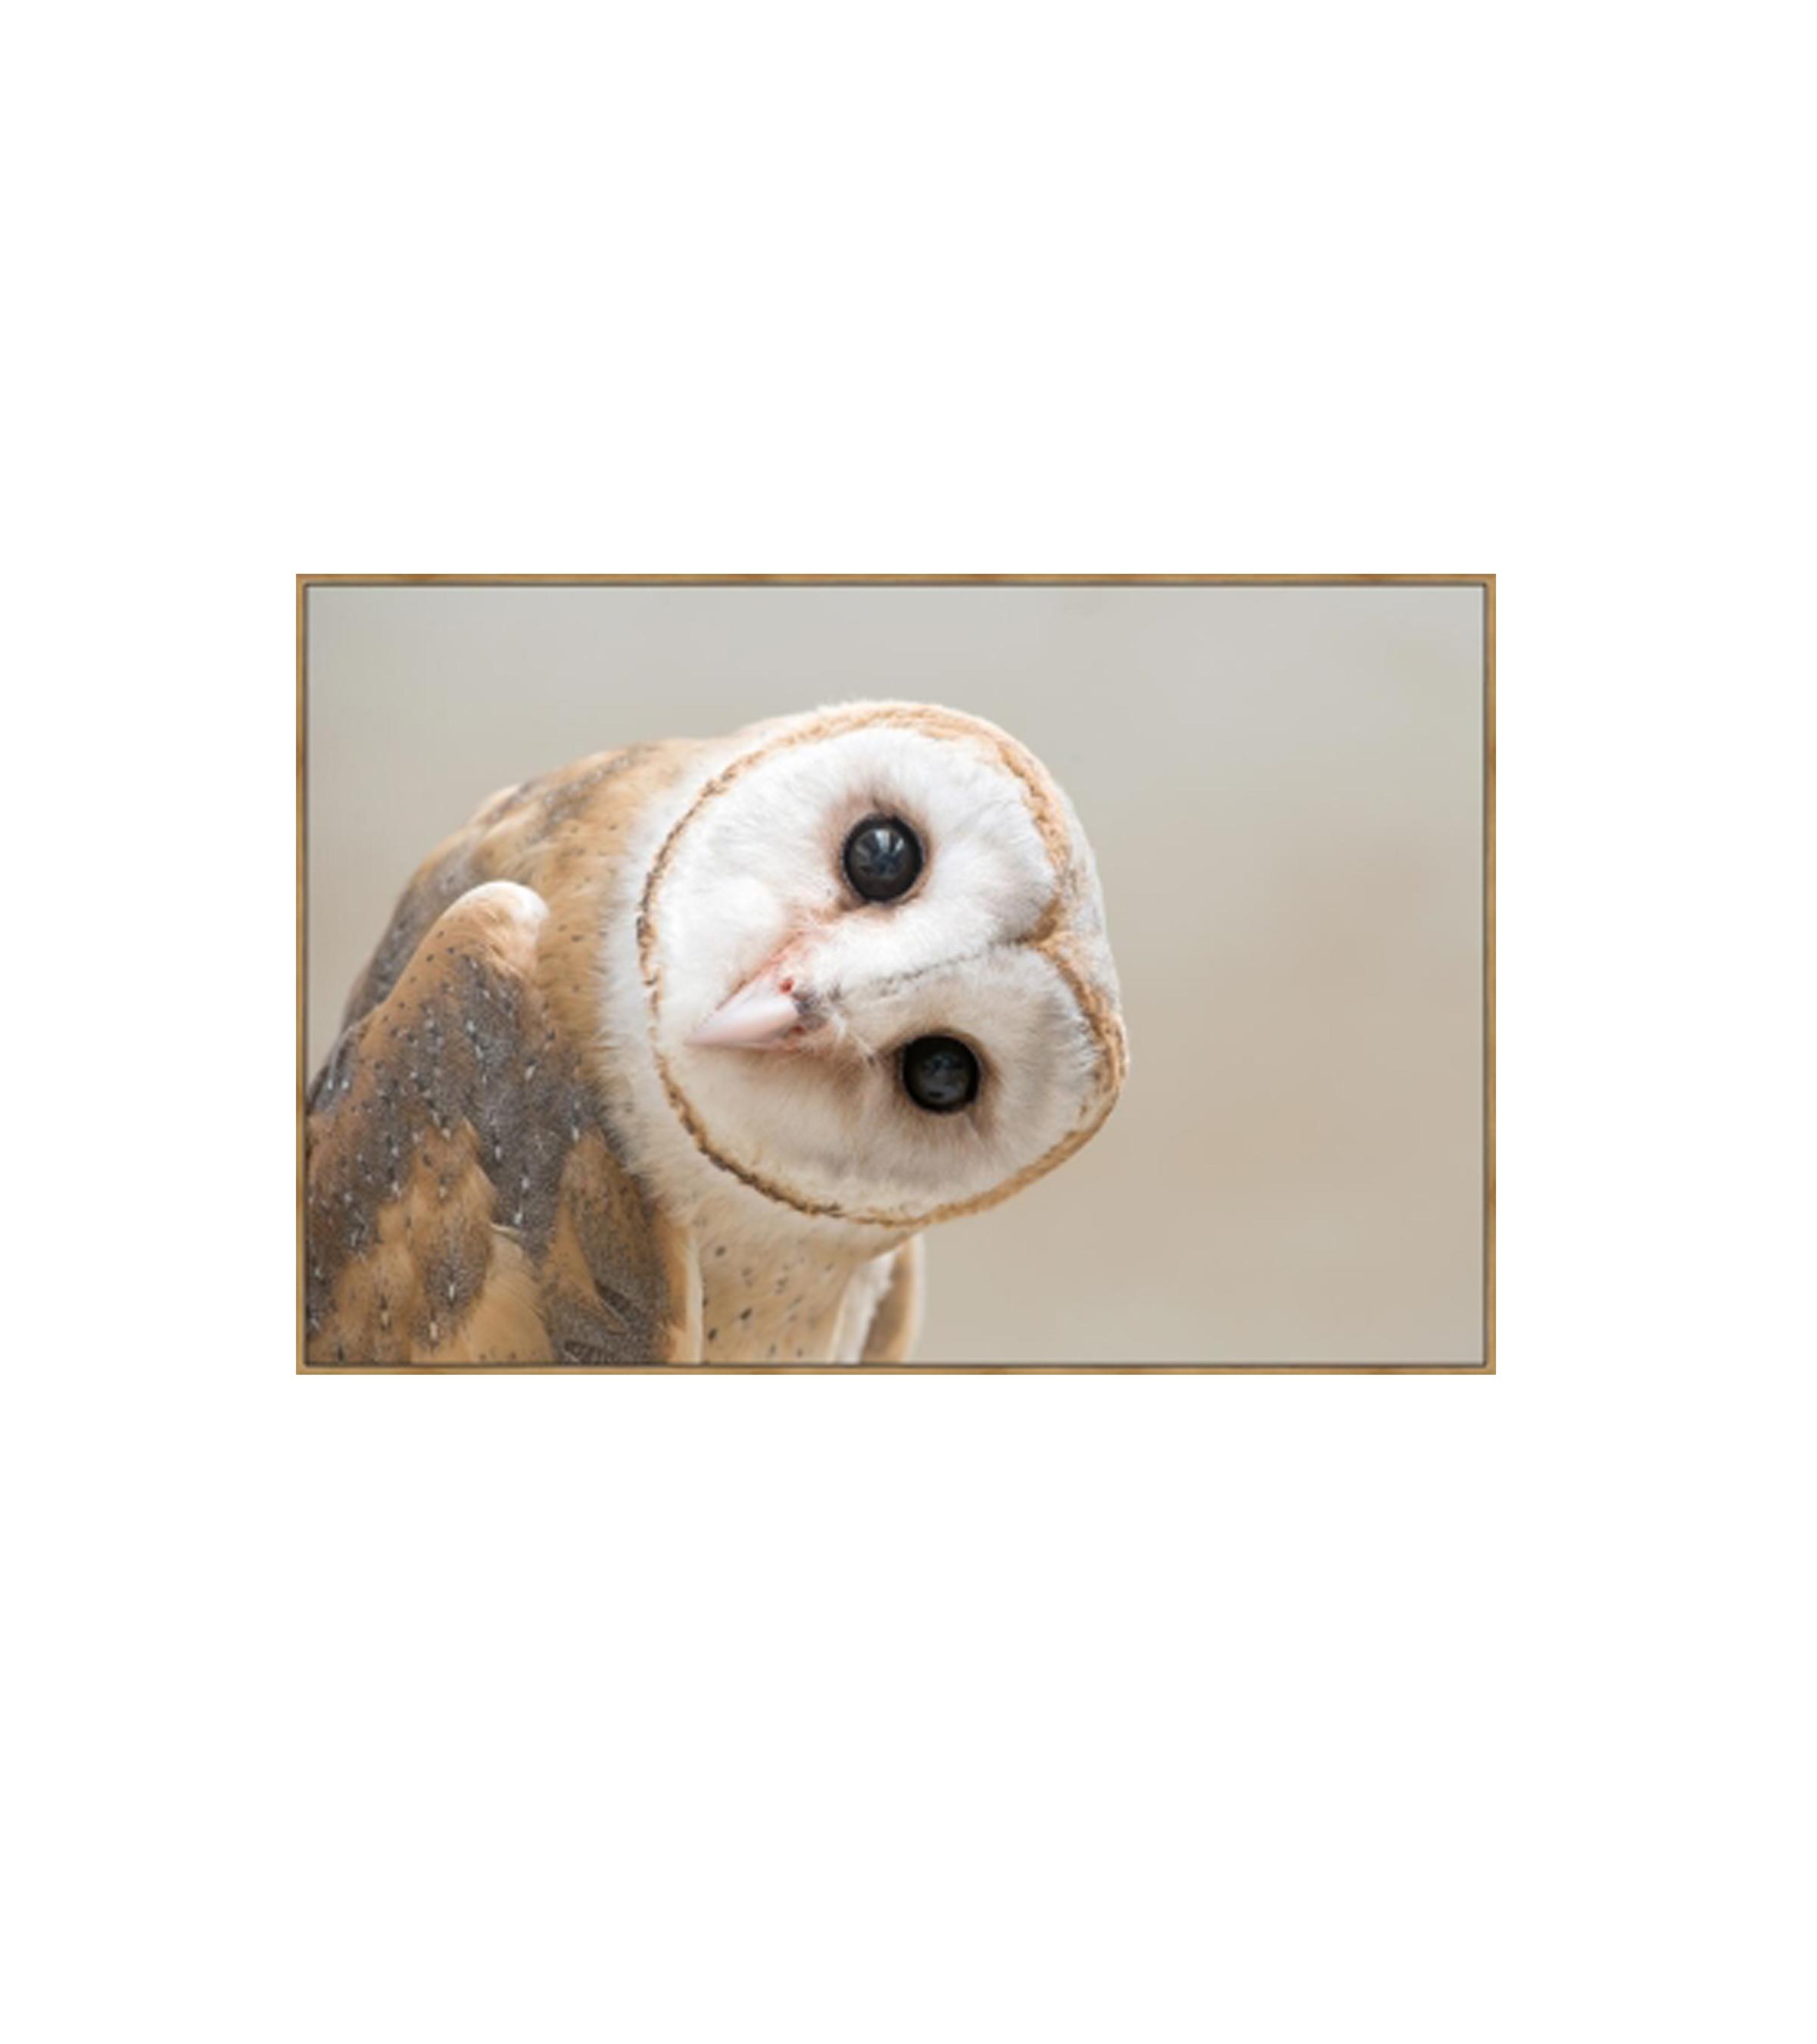 Cheeky owl